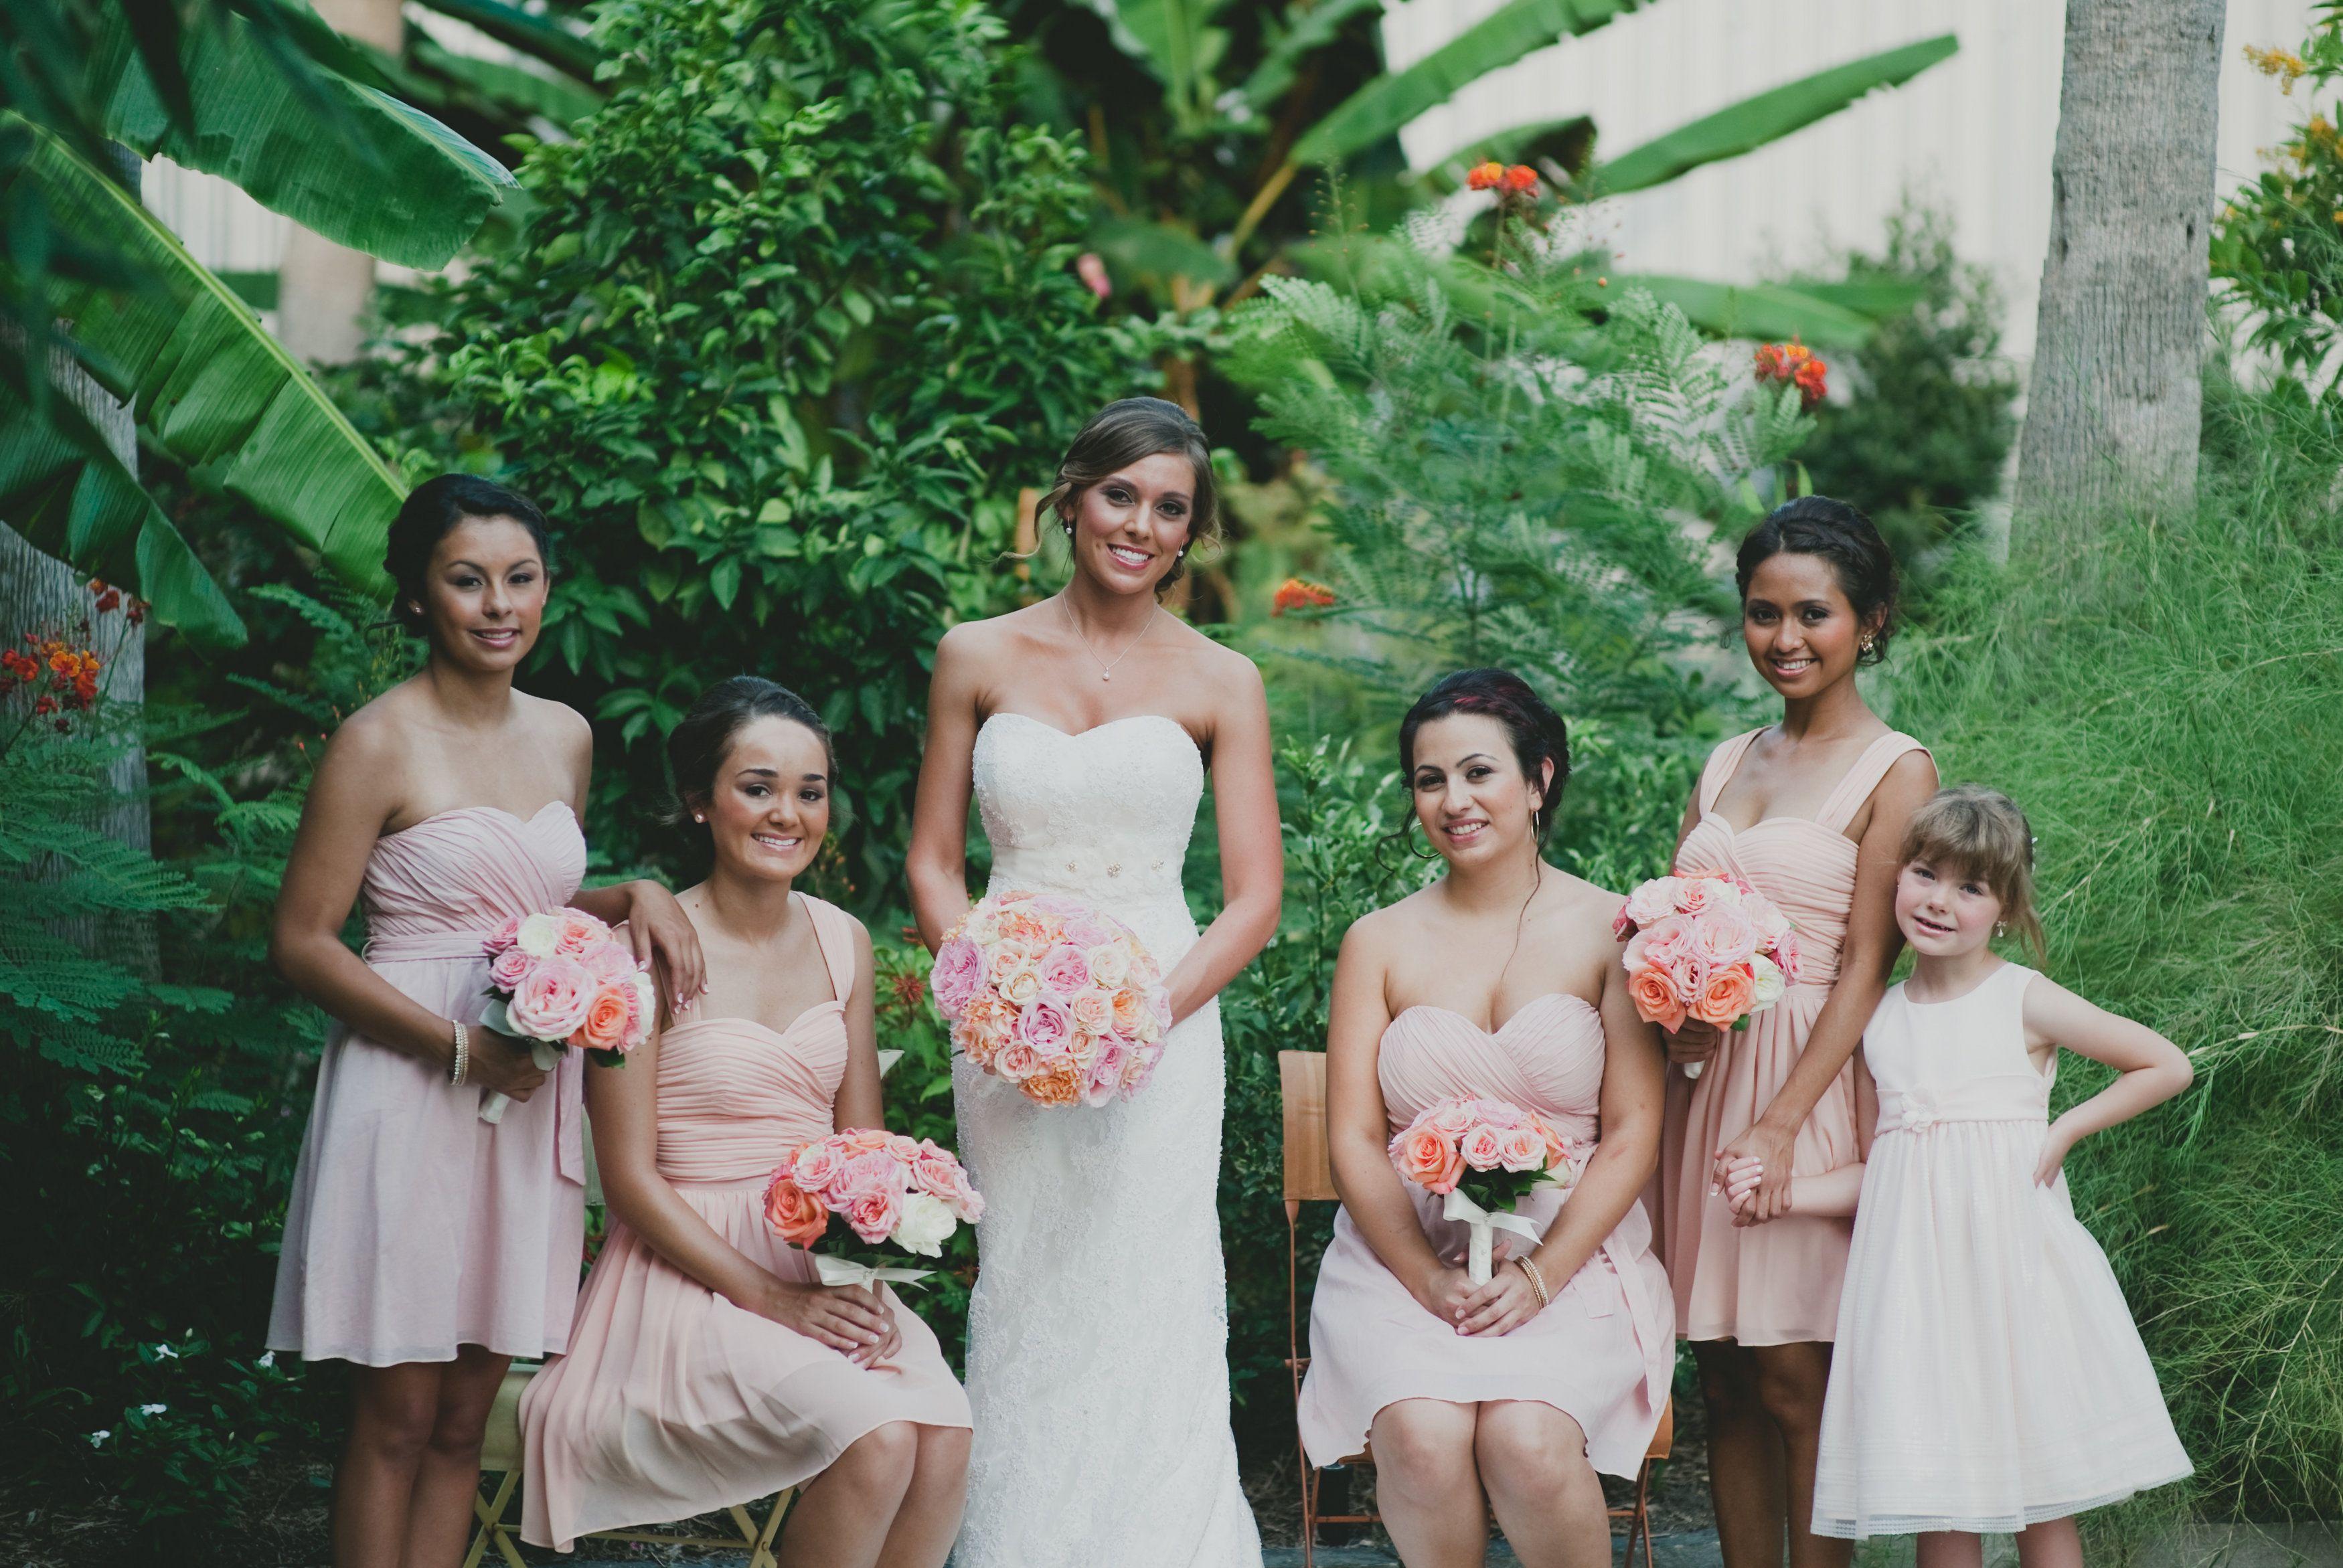 www.5226elm.com Wedding Ceremony and Reception Corporate ...